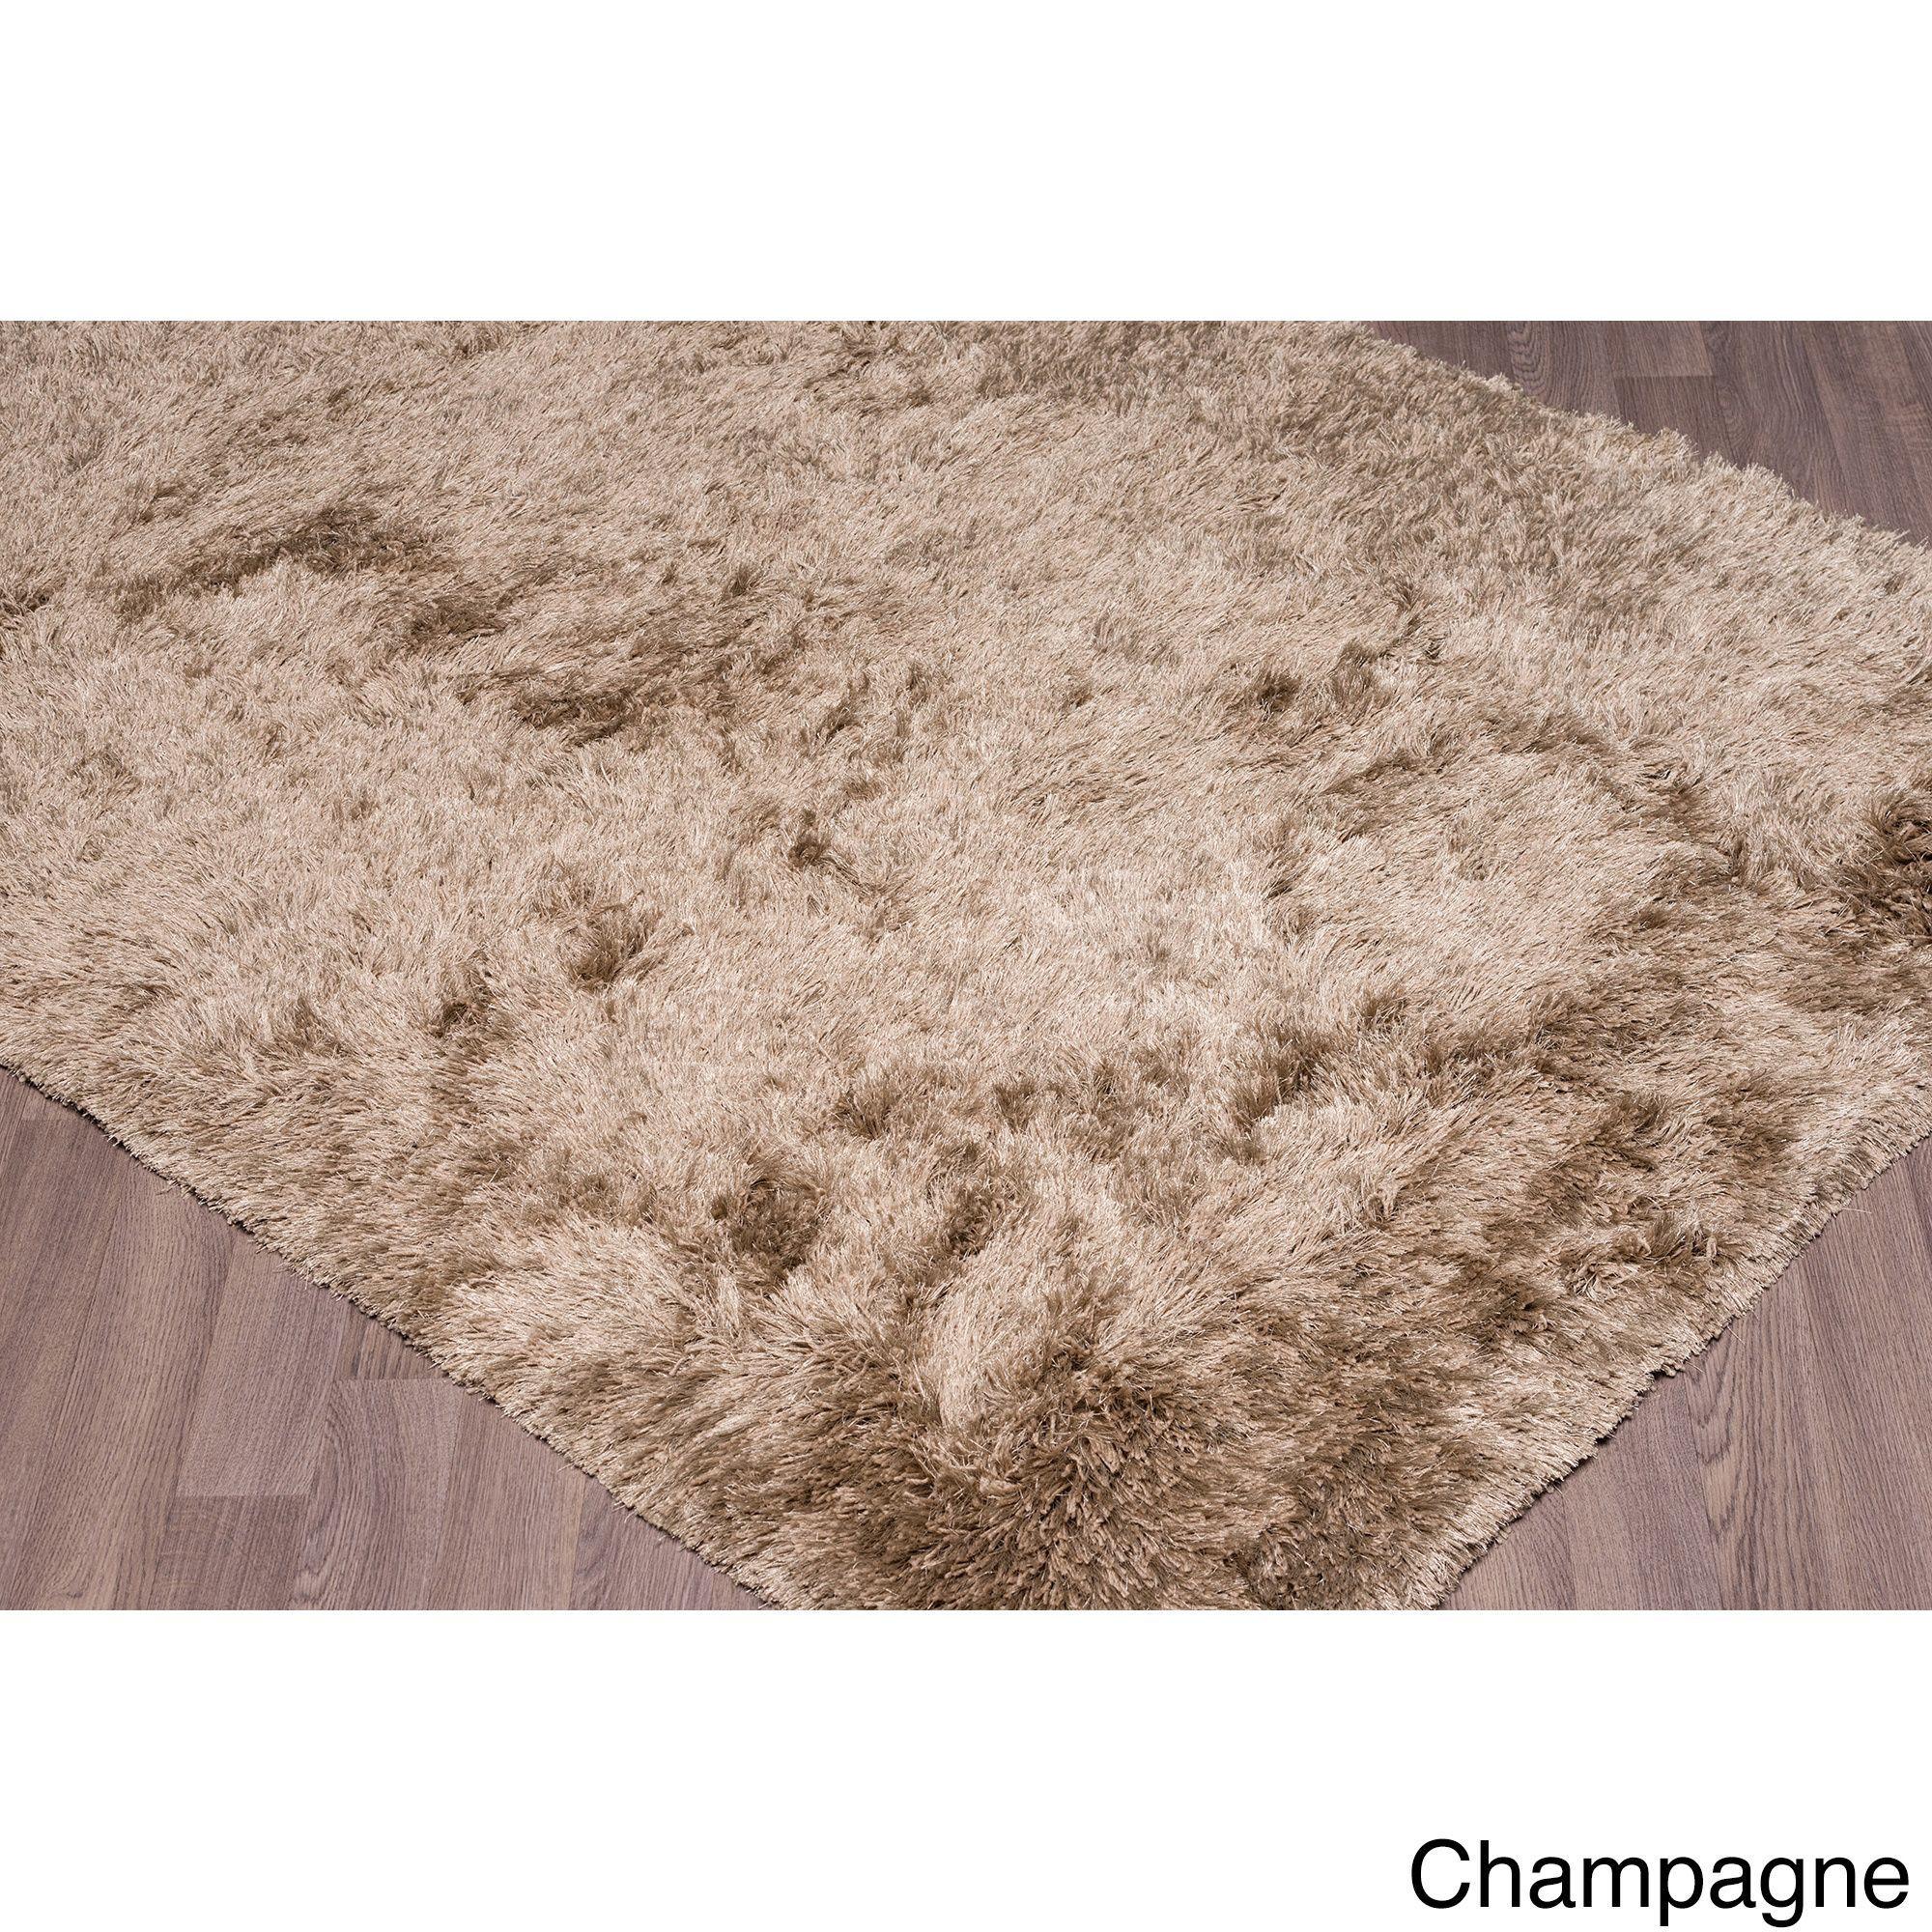 "Super Soft Plush Shag Rug (5'x7'.6"") (Moderna 5x7.6_Champange), Beige, Size 5' x 7'6"" (Cotton, Solid)"